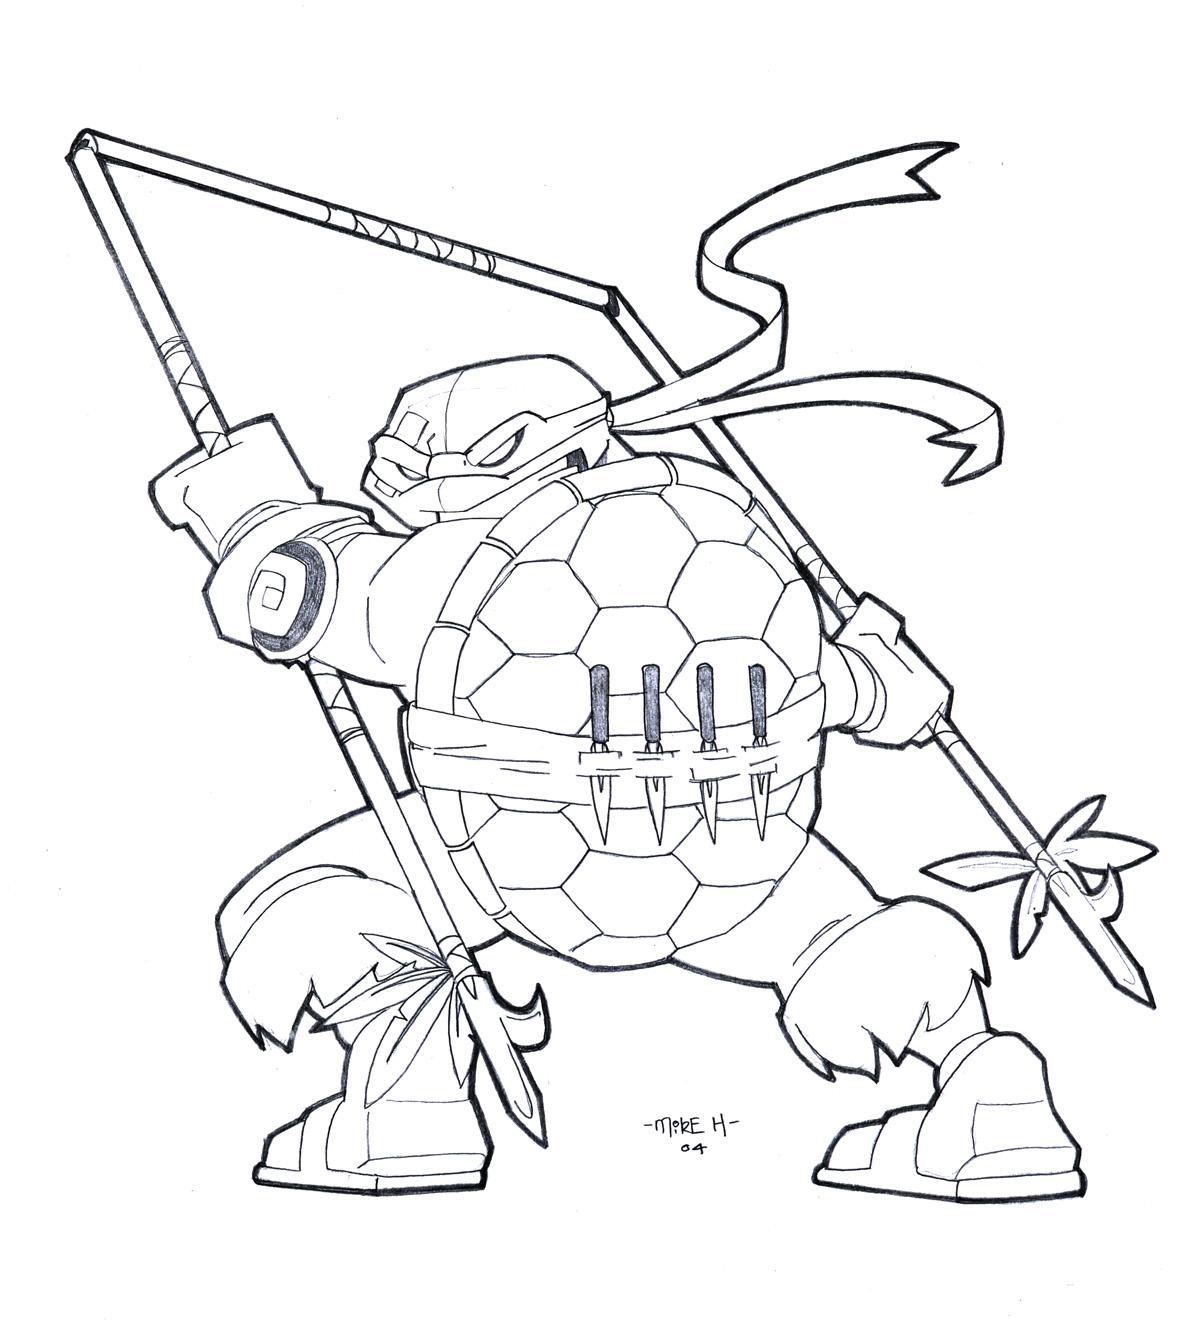 ralph ninja turtle dessin à colorier ralph ninja turtle dessin à colorier